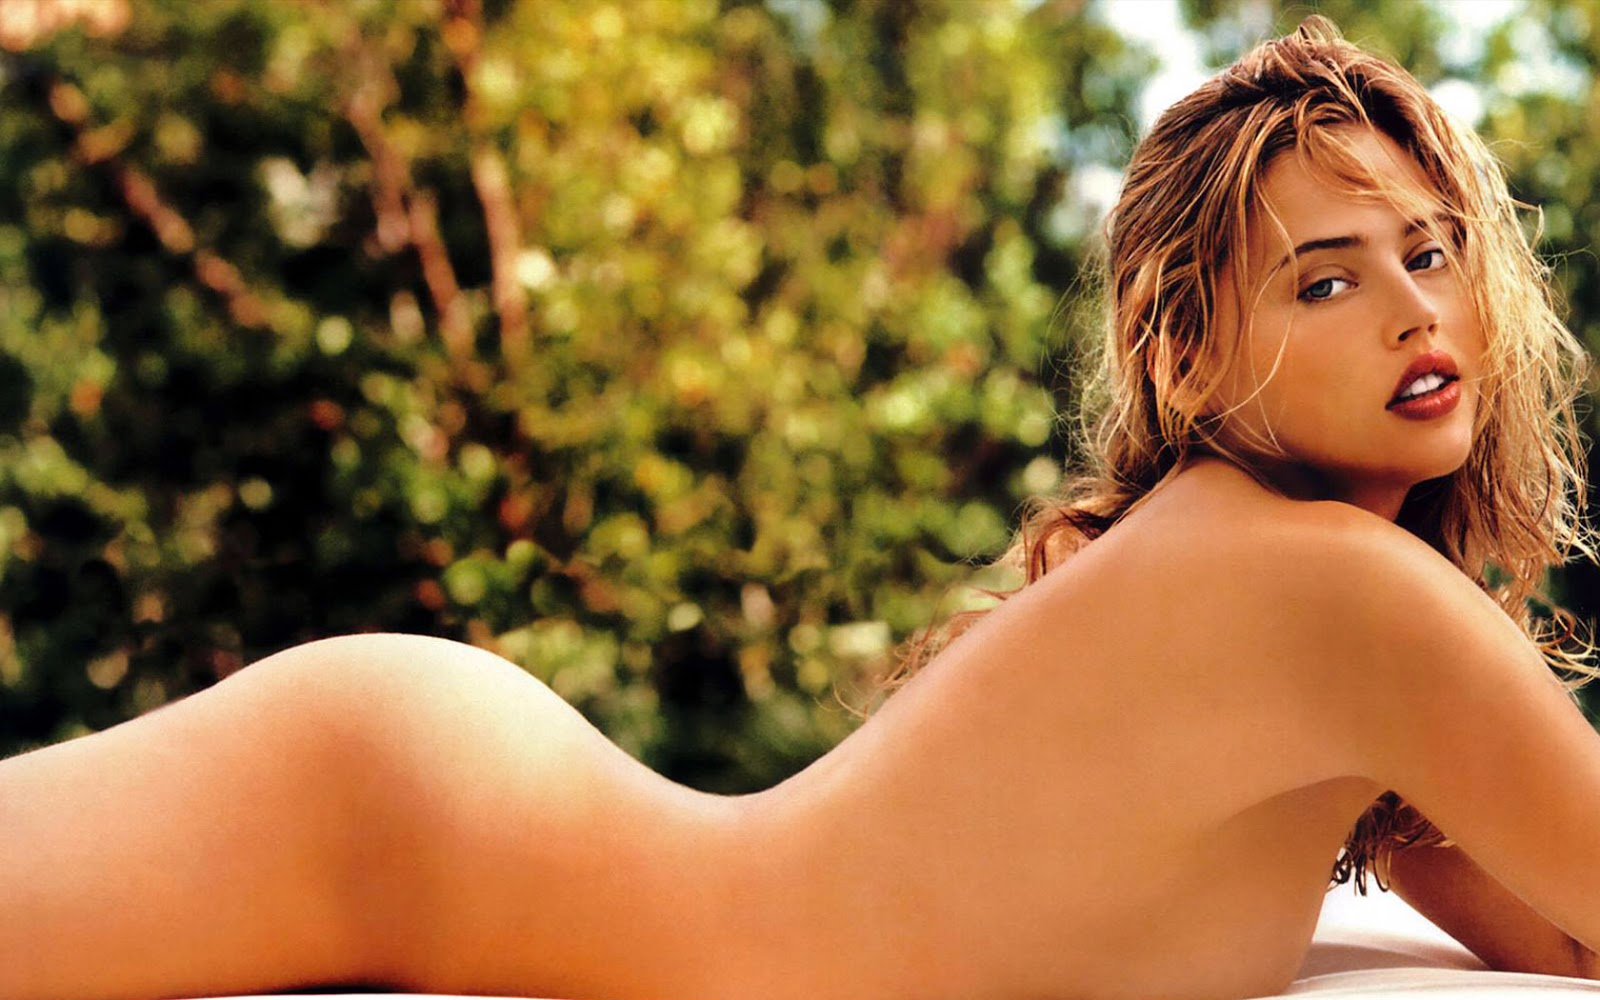 Nude Screensavers Free 69